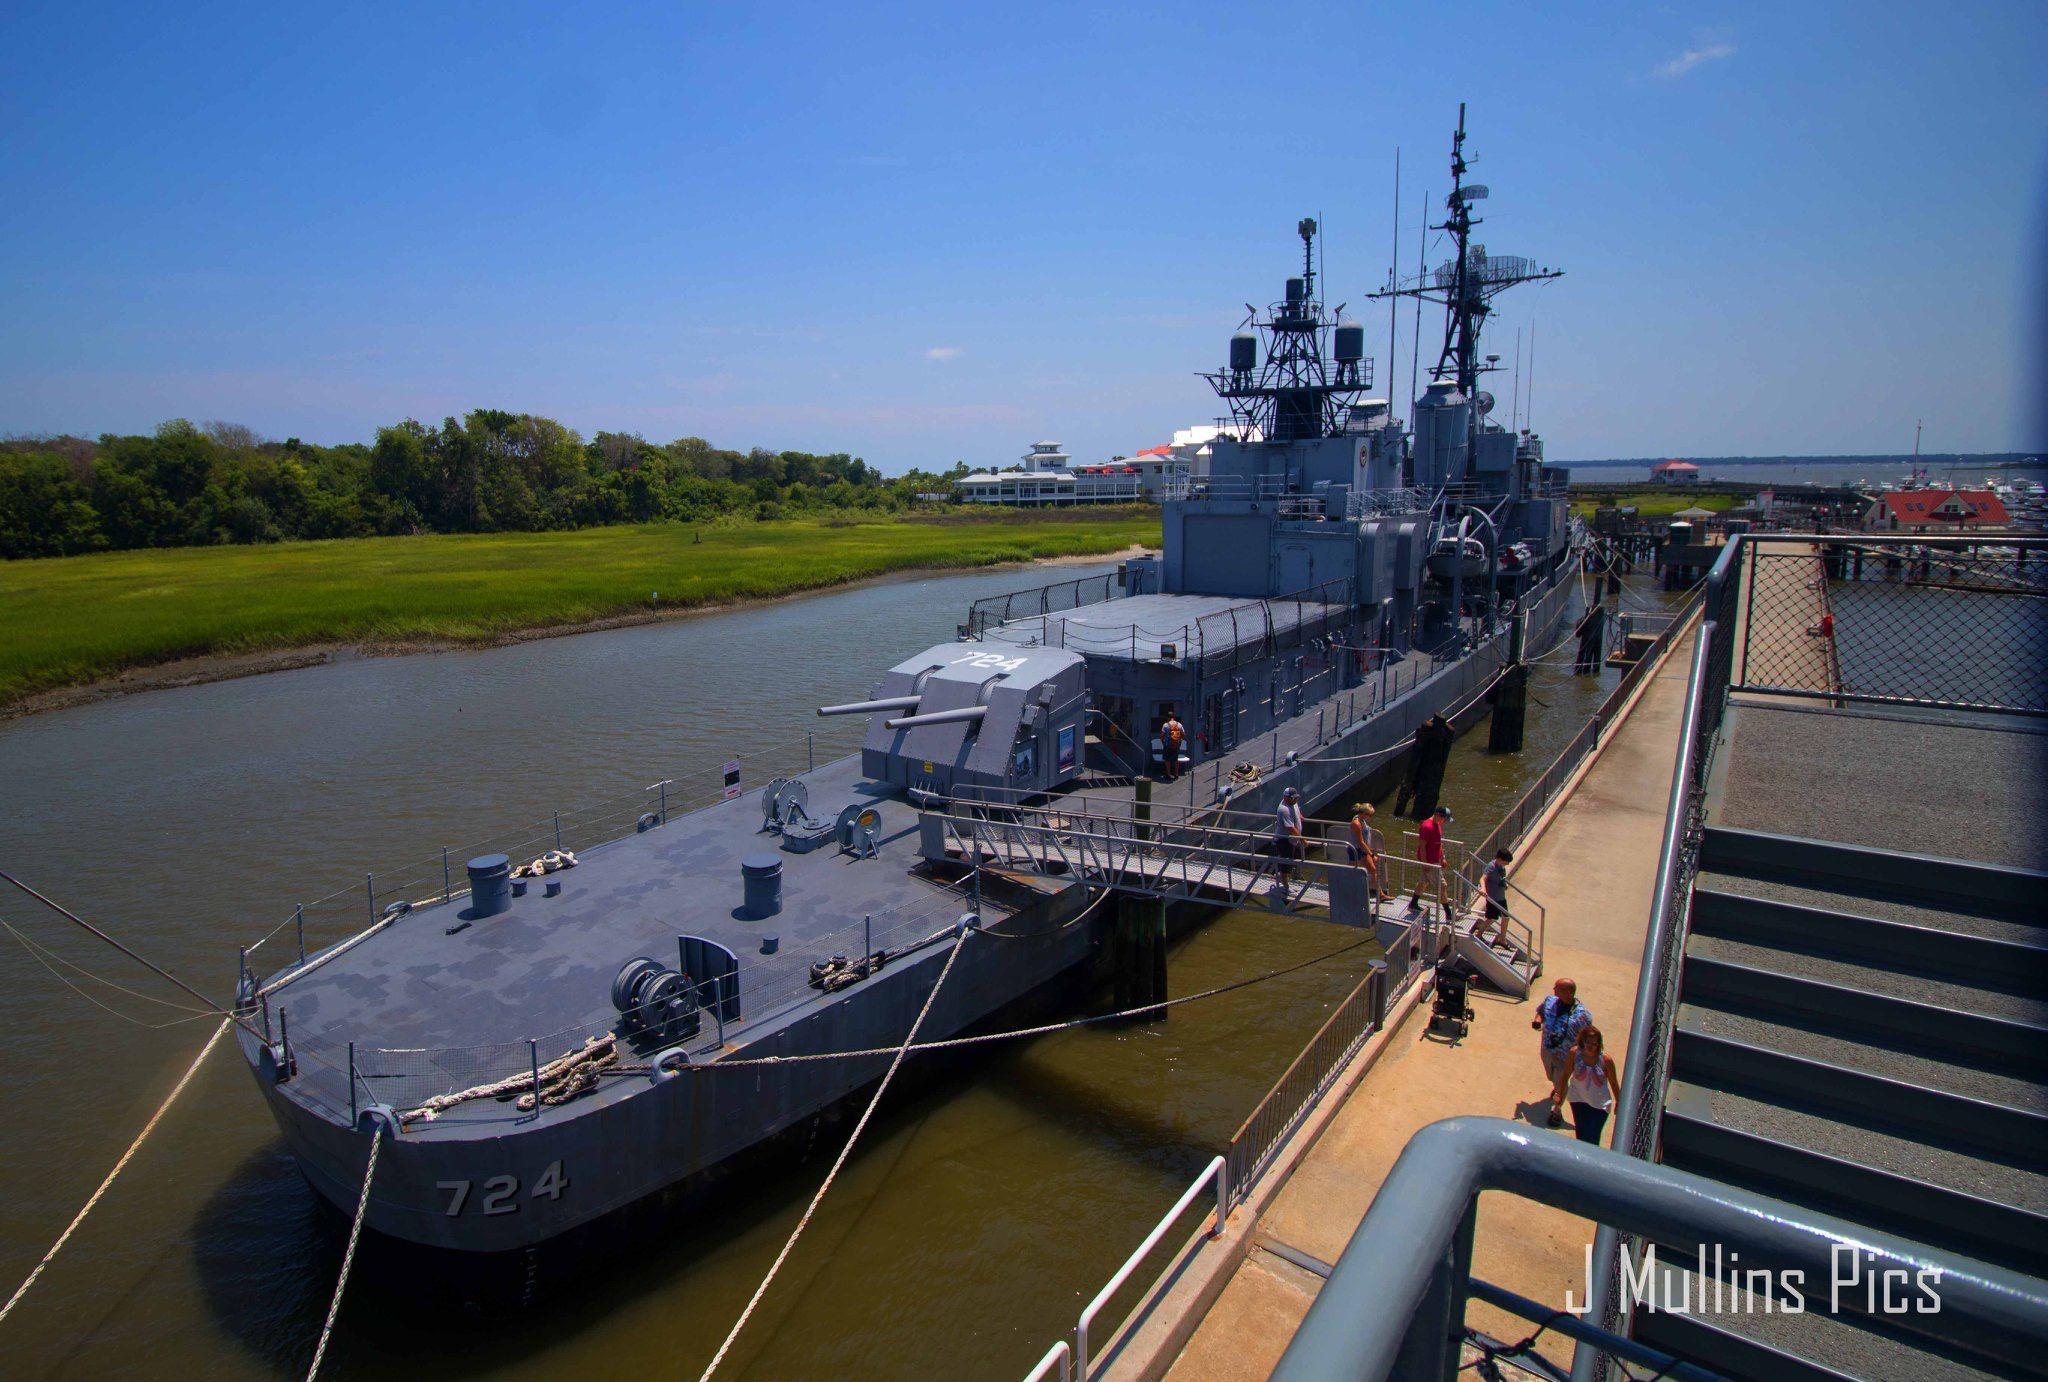 Patriots Point Charleston South Carolina Uss Yorktown Aircraft Carrier Uss Laffey Destroyer Uss Clamagore Uss Yorktown Uss Laffey Charleston South Carolina